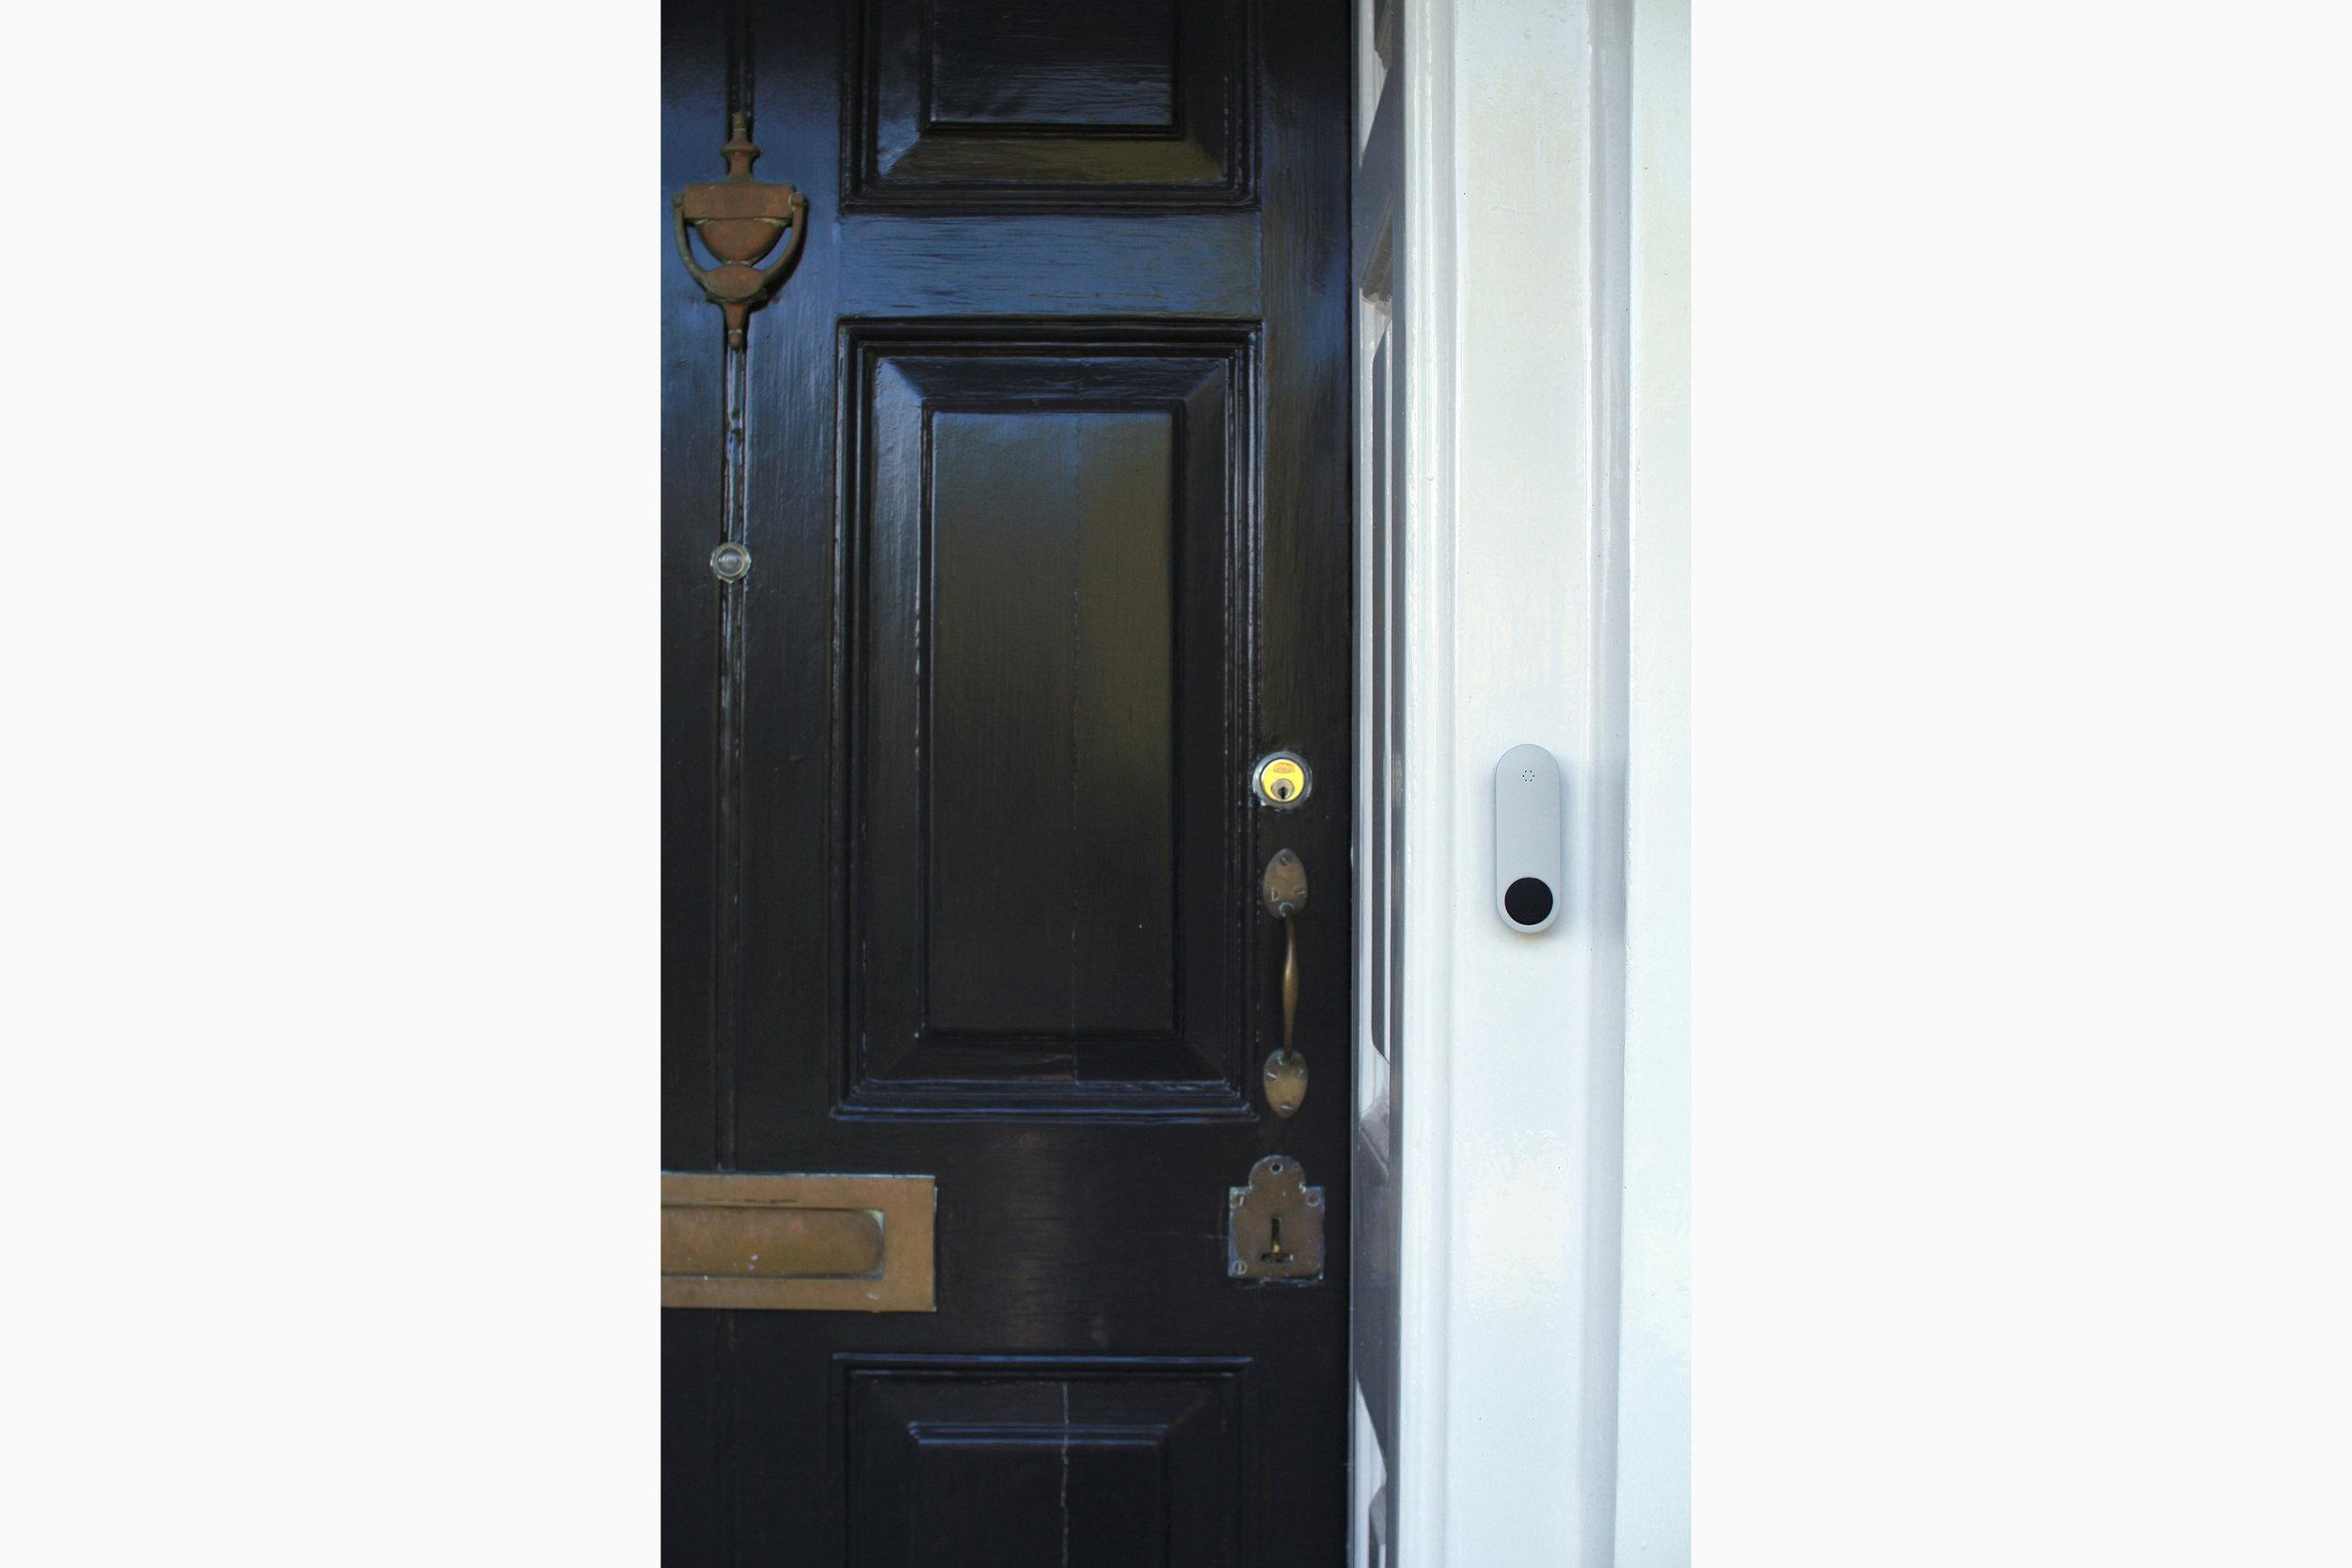 ding-smart-doorbell-design-products-technology_dezeen_2364_col_1-1.jpg